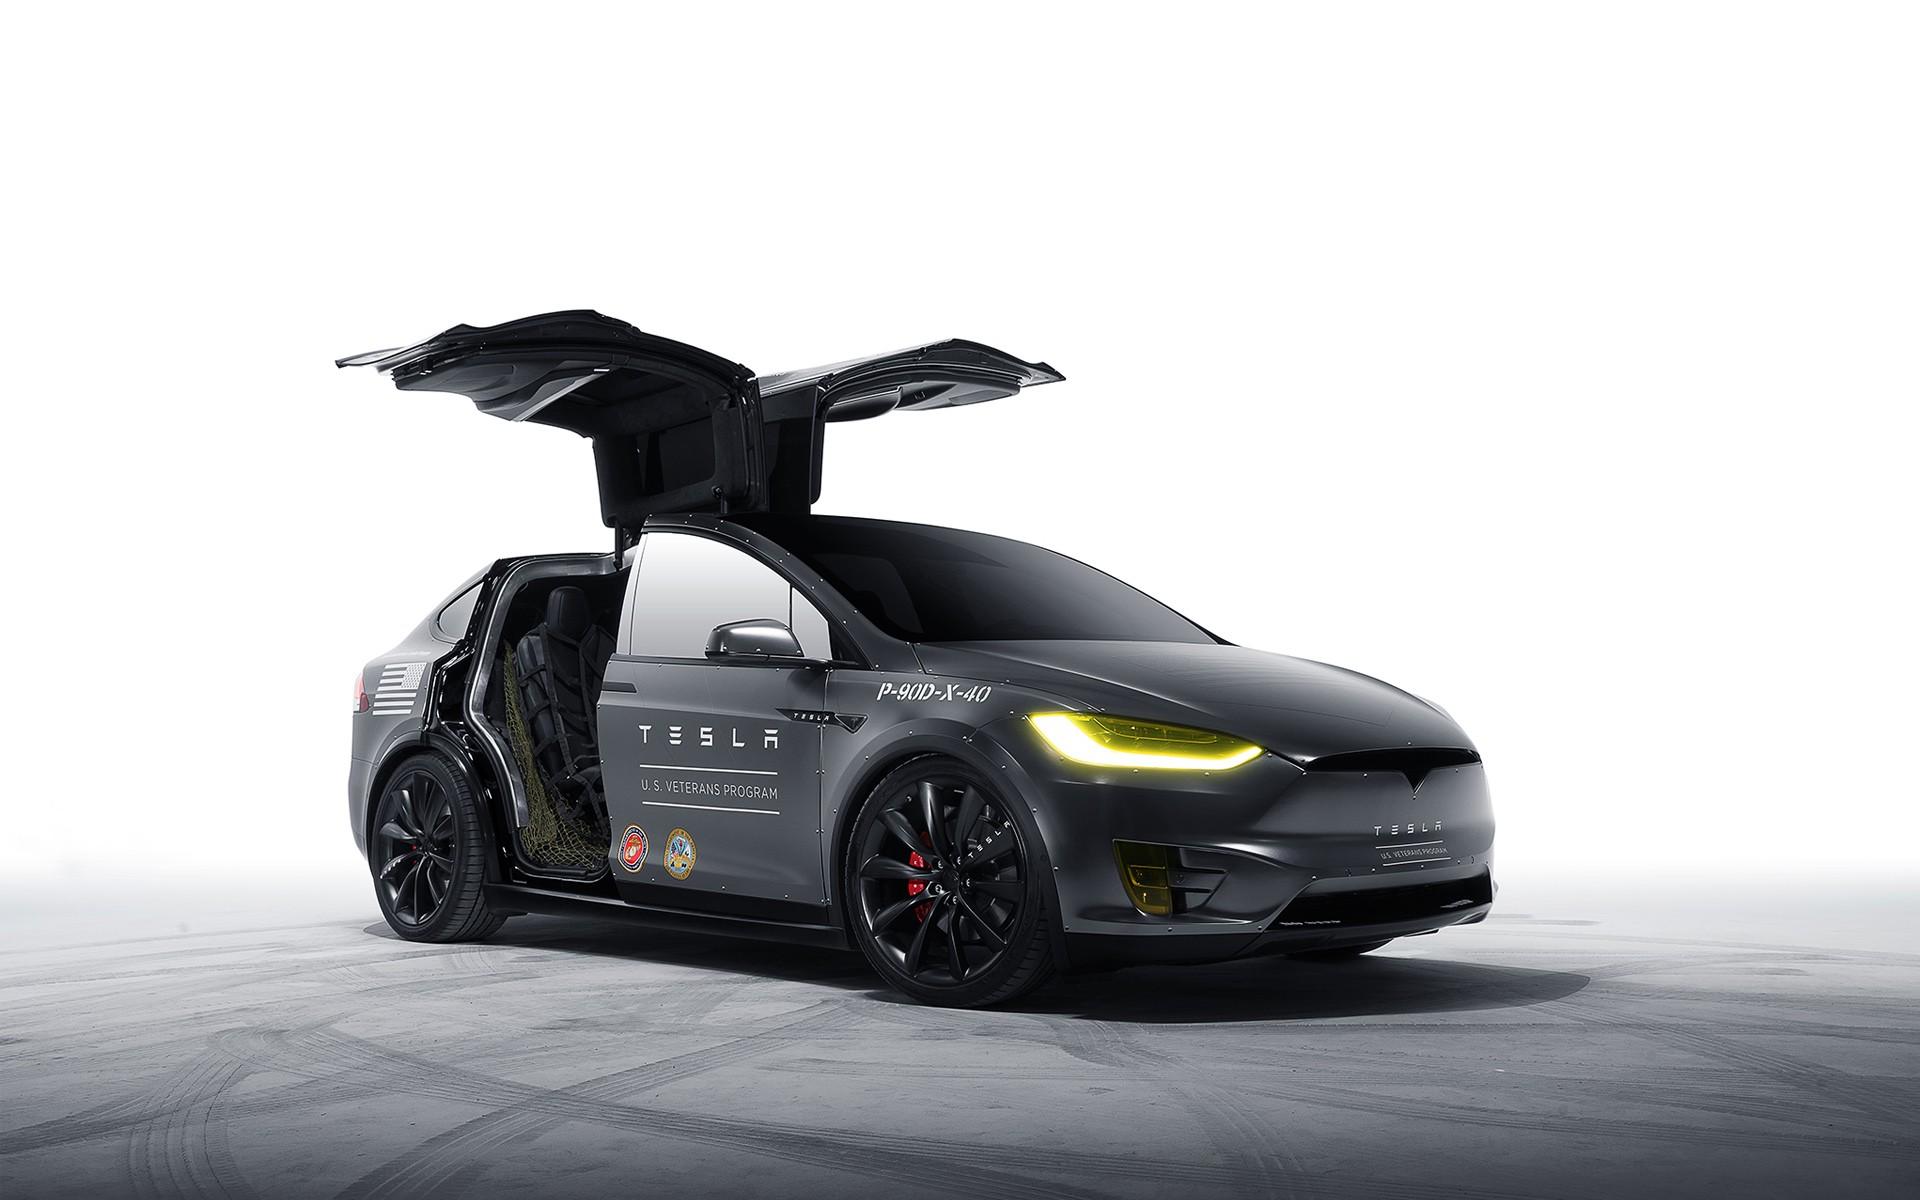 Iphone Wallpaper Muscle Car Model X Tesla Motors Wallpaper Hd Car Wallpapers Id 5976